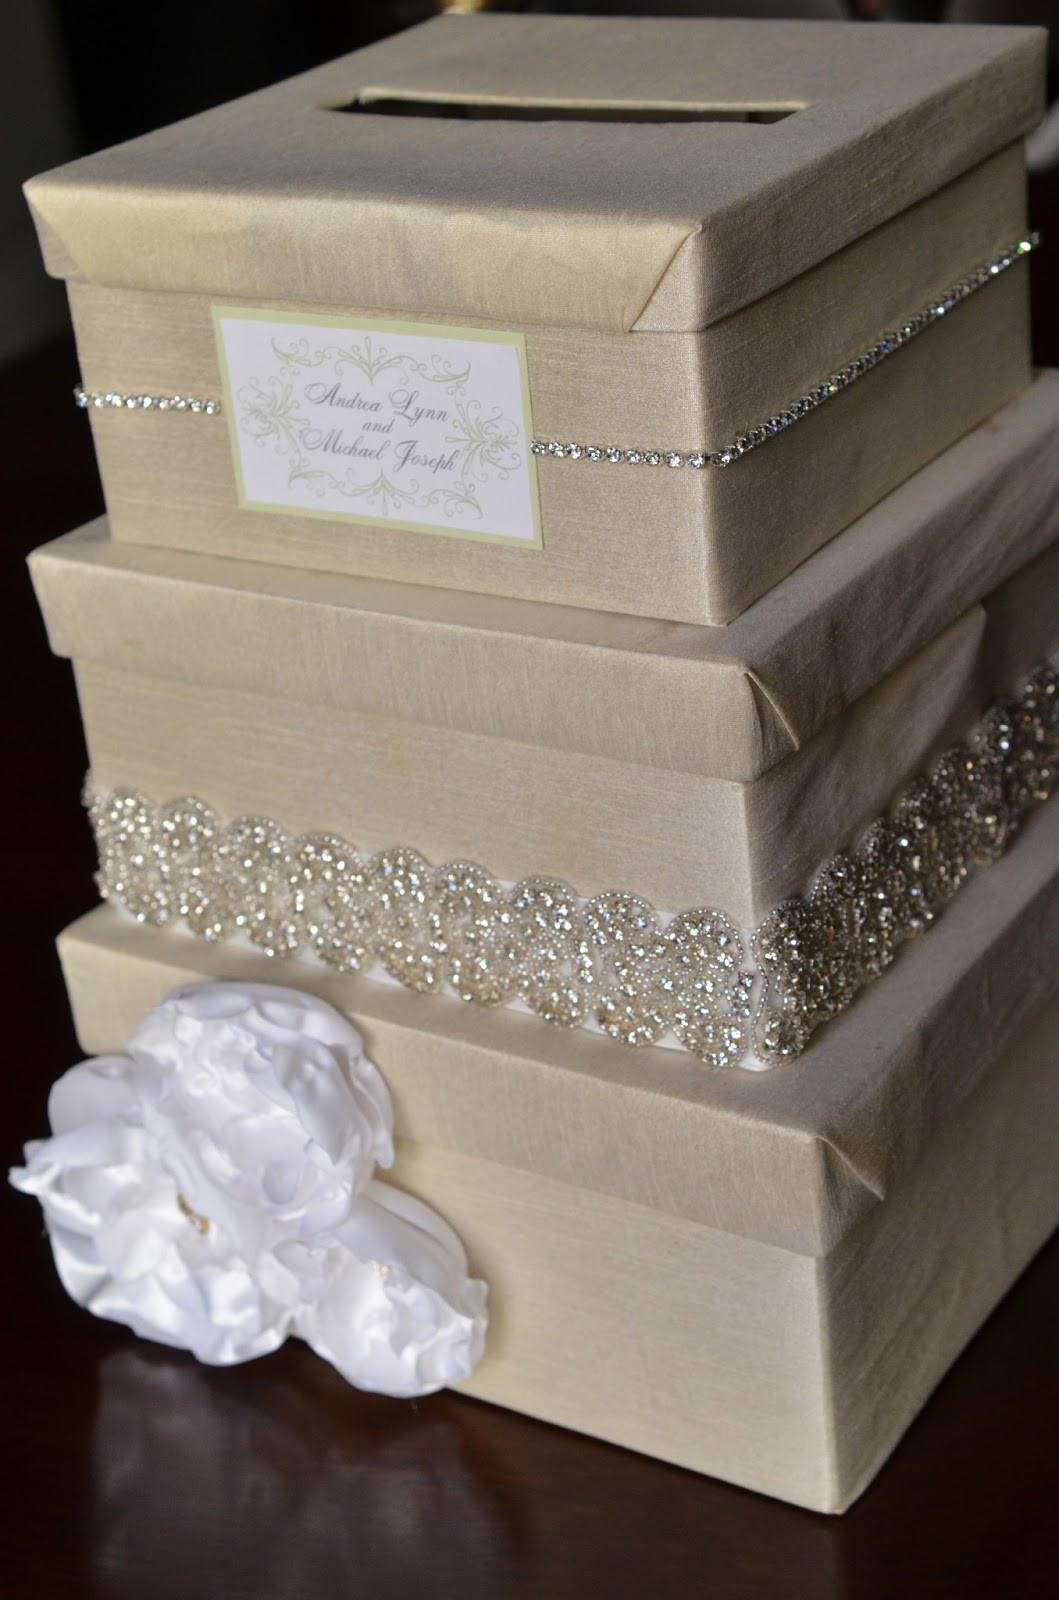 DIY Gift Card Boxes  DIY Wedding Card Box Tutorial Andrea Lynn HANDMADE